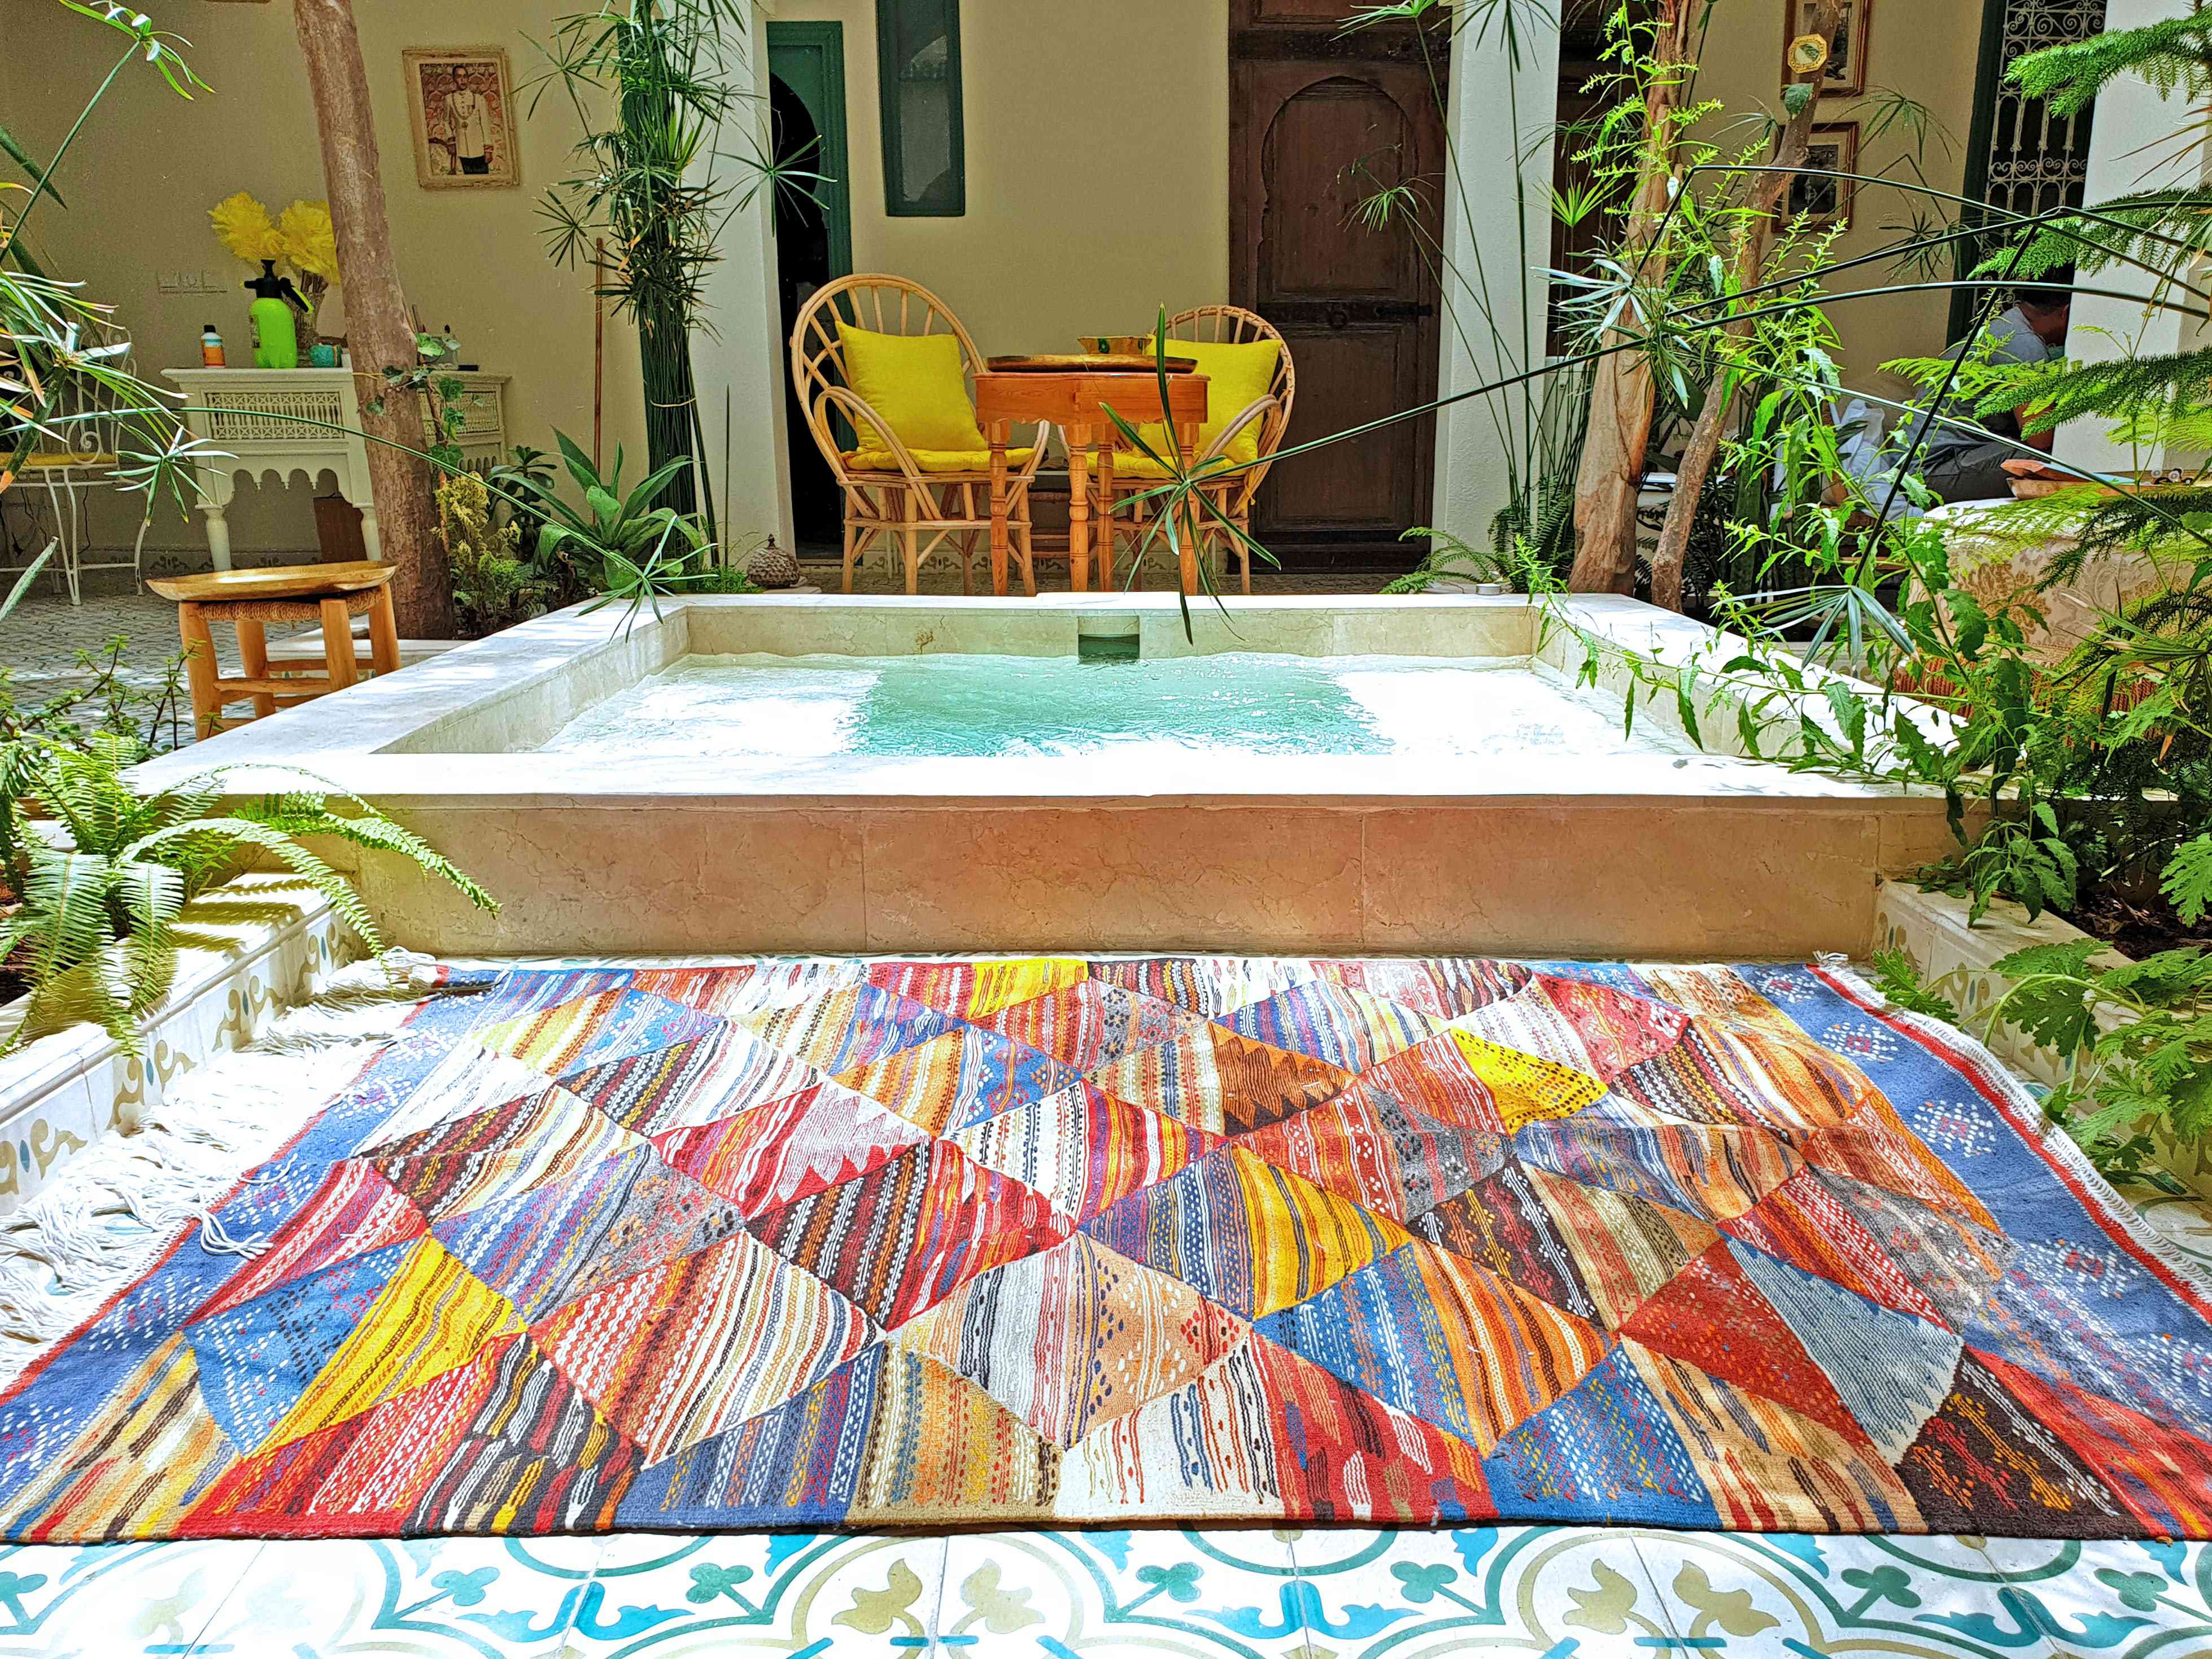 hot tub outdoors